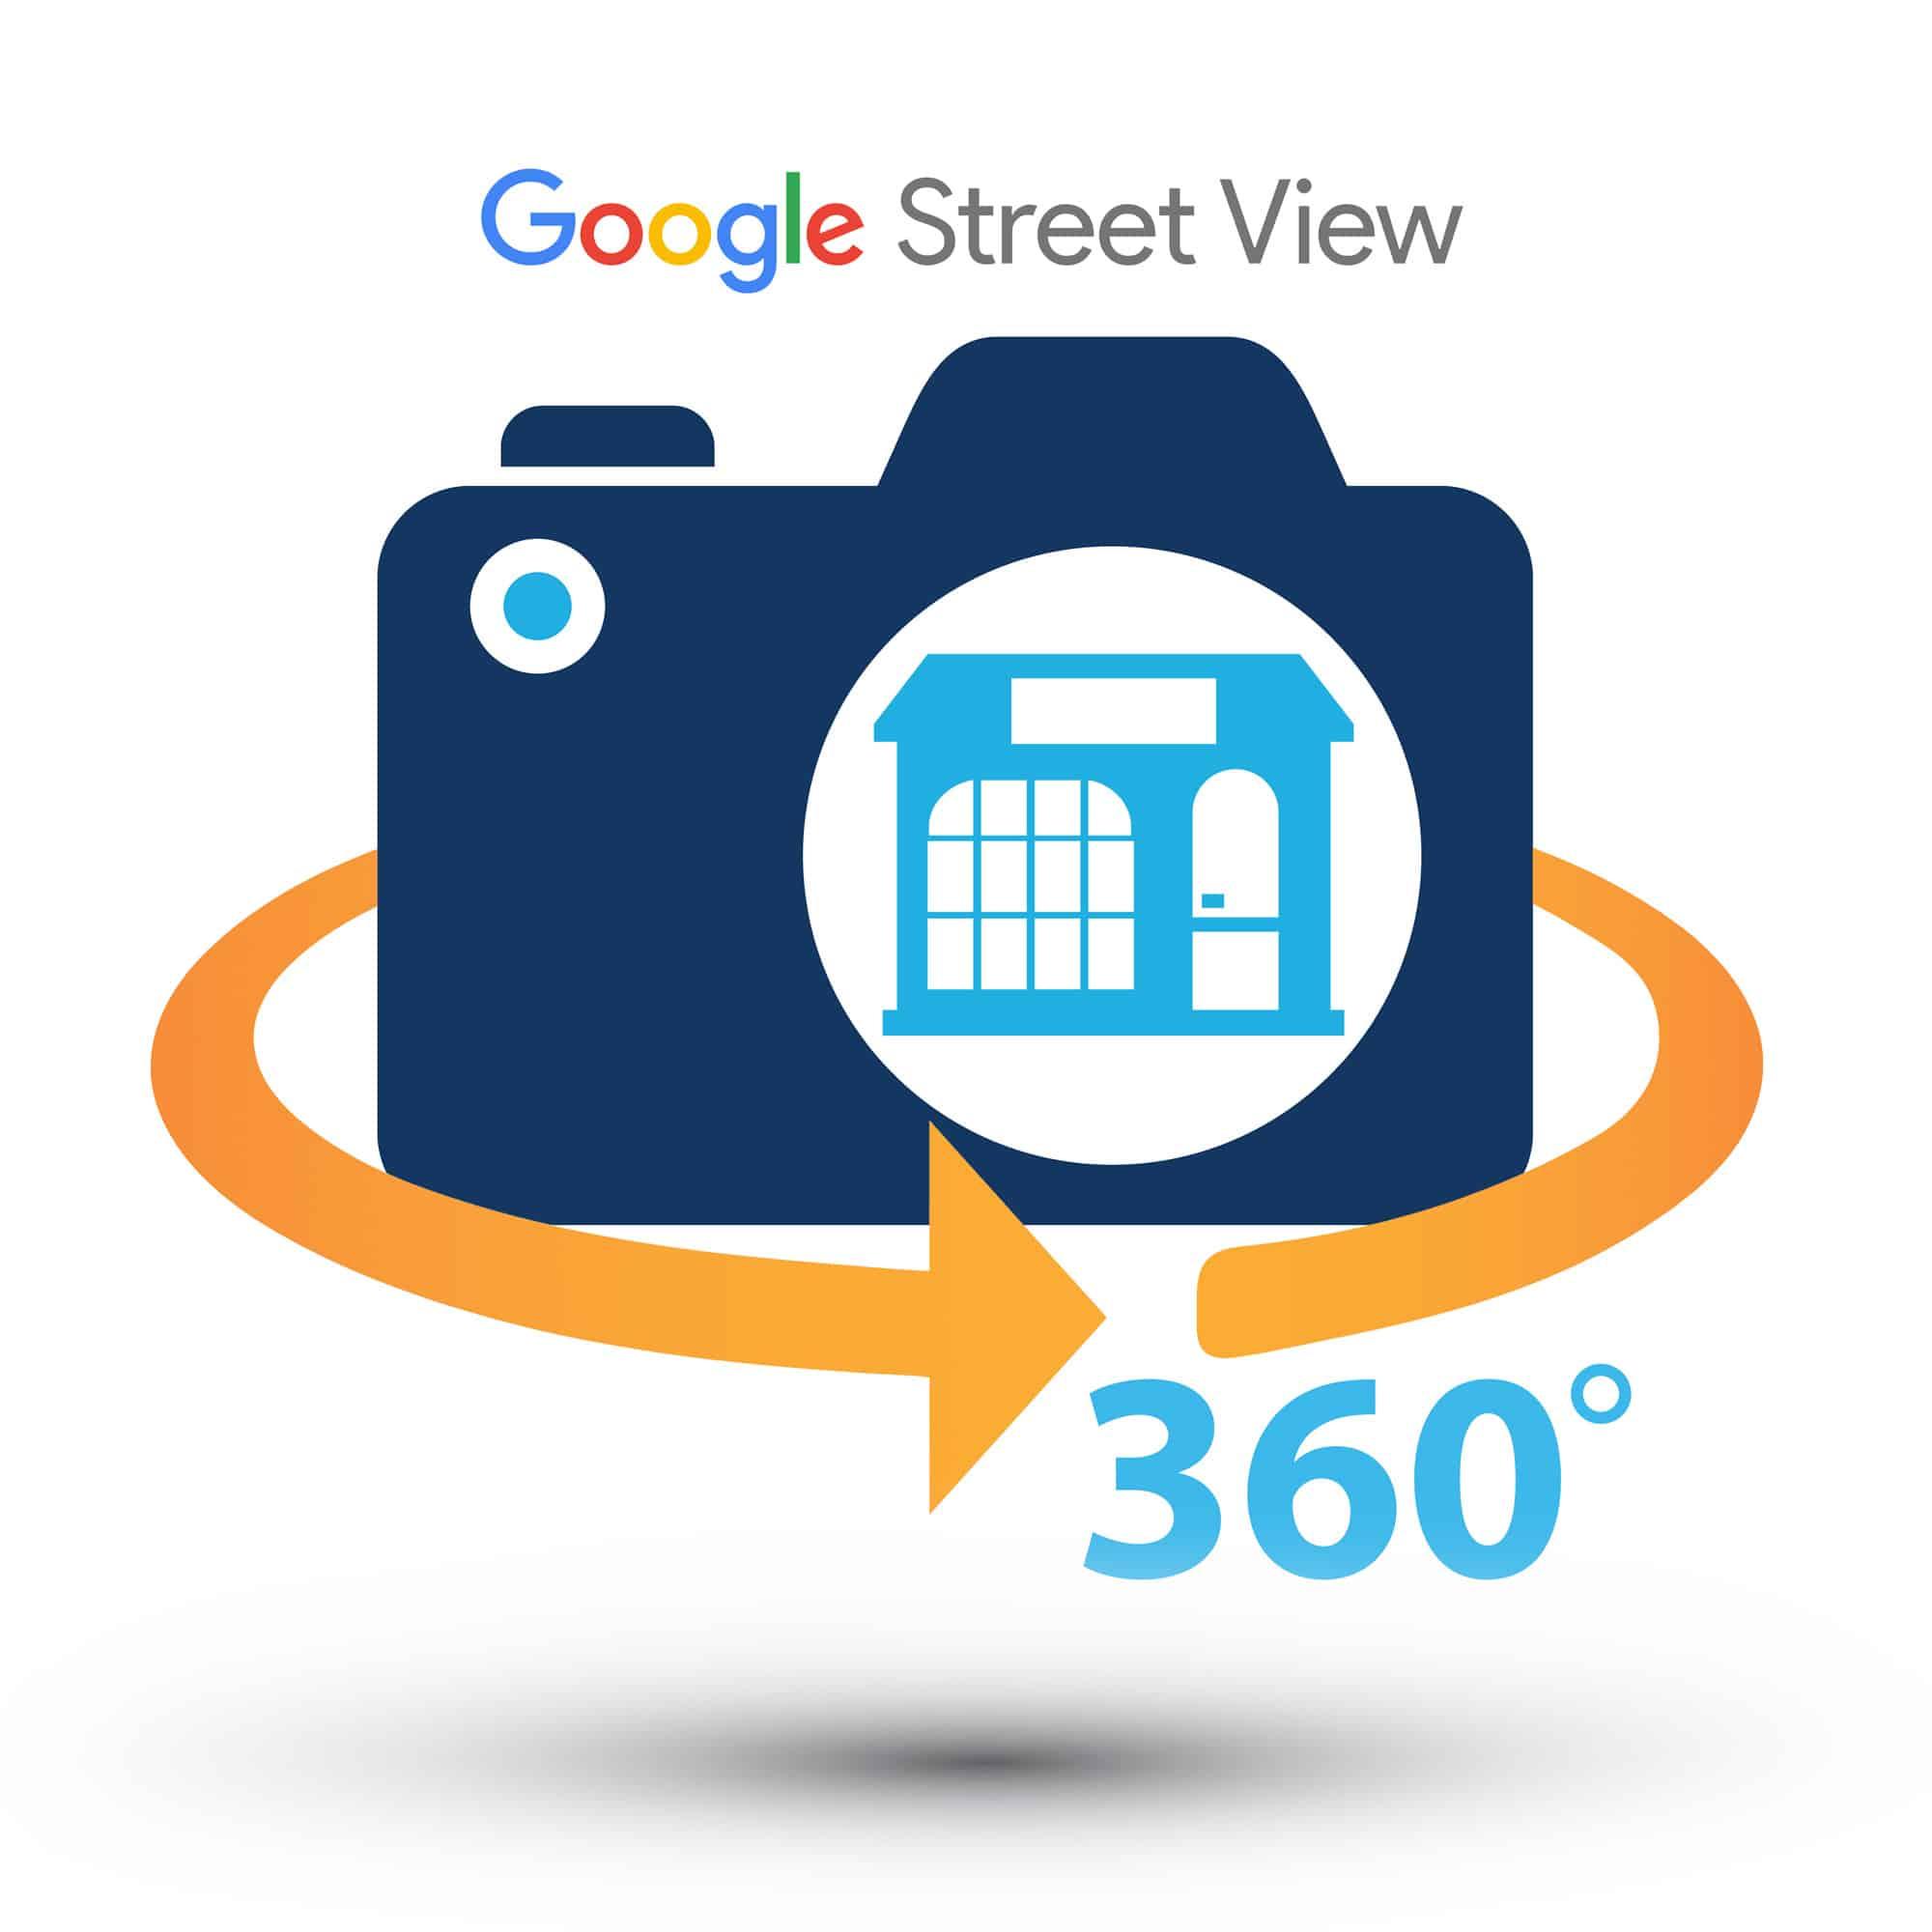 360 google street view